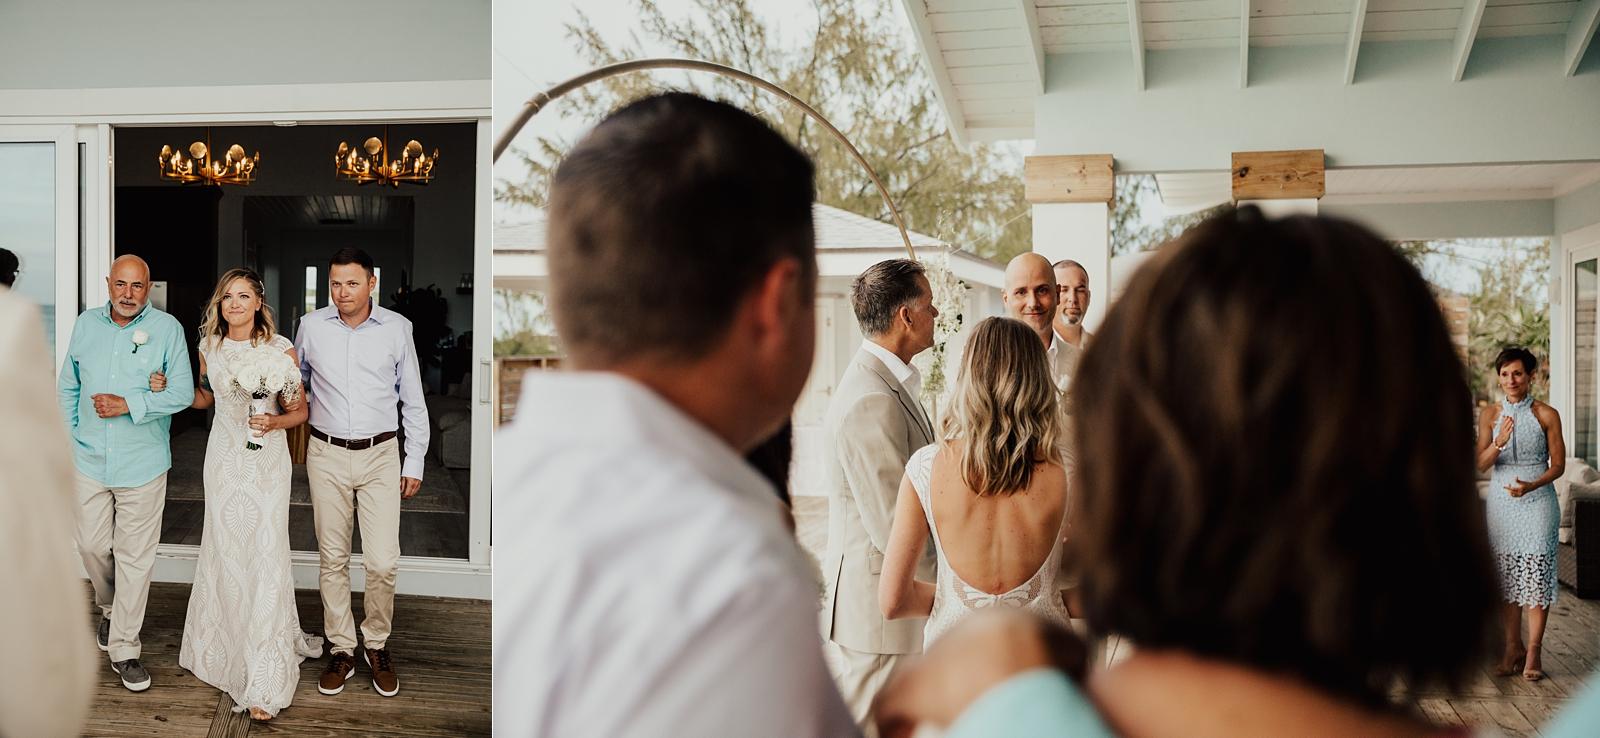 Jenni & Andrew Intimate Beach Destination Wedding in Little Exuma, Bahamas_0503.jpg